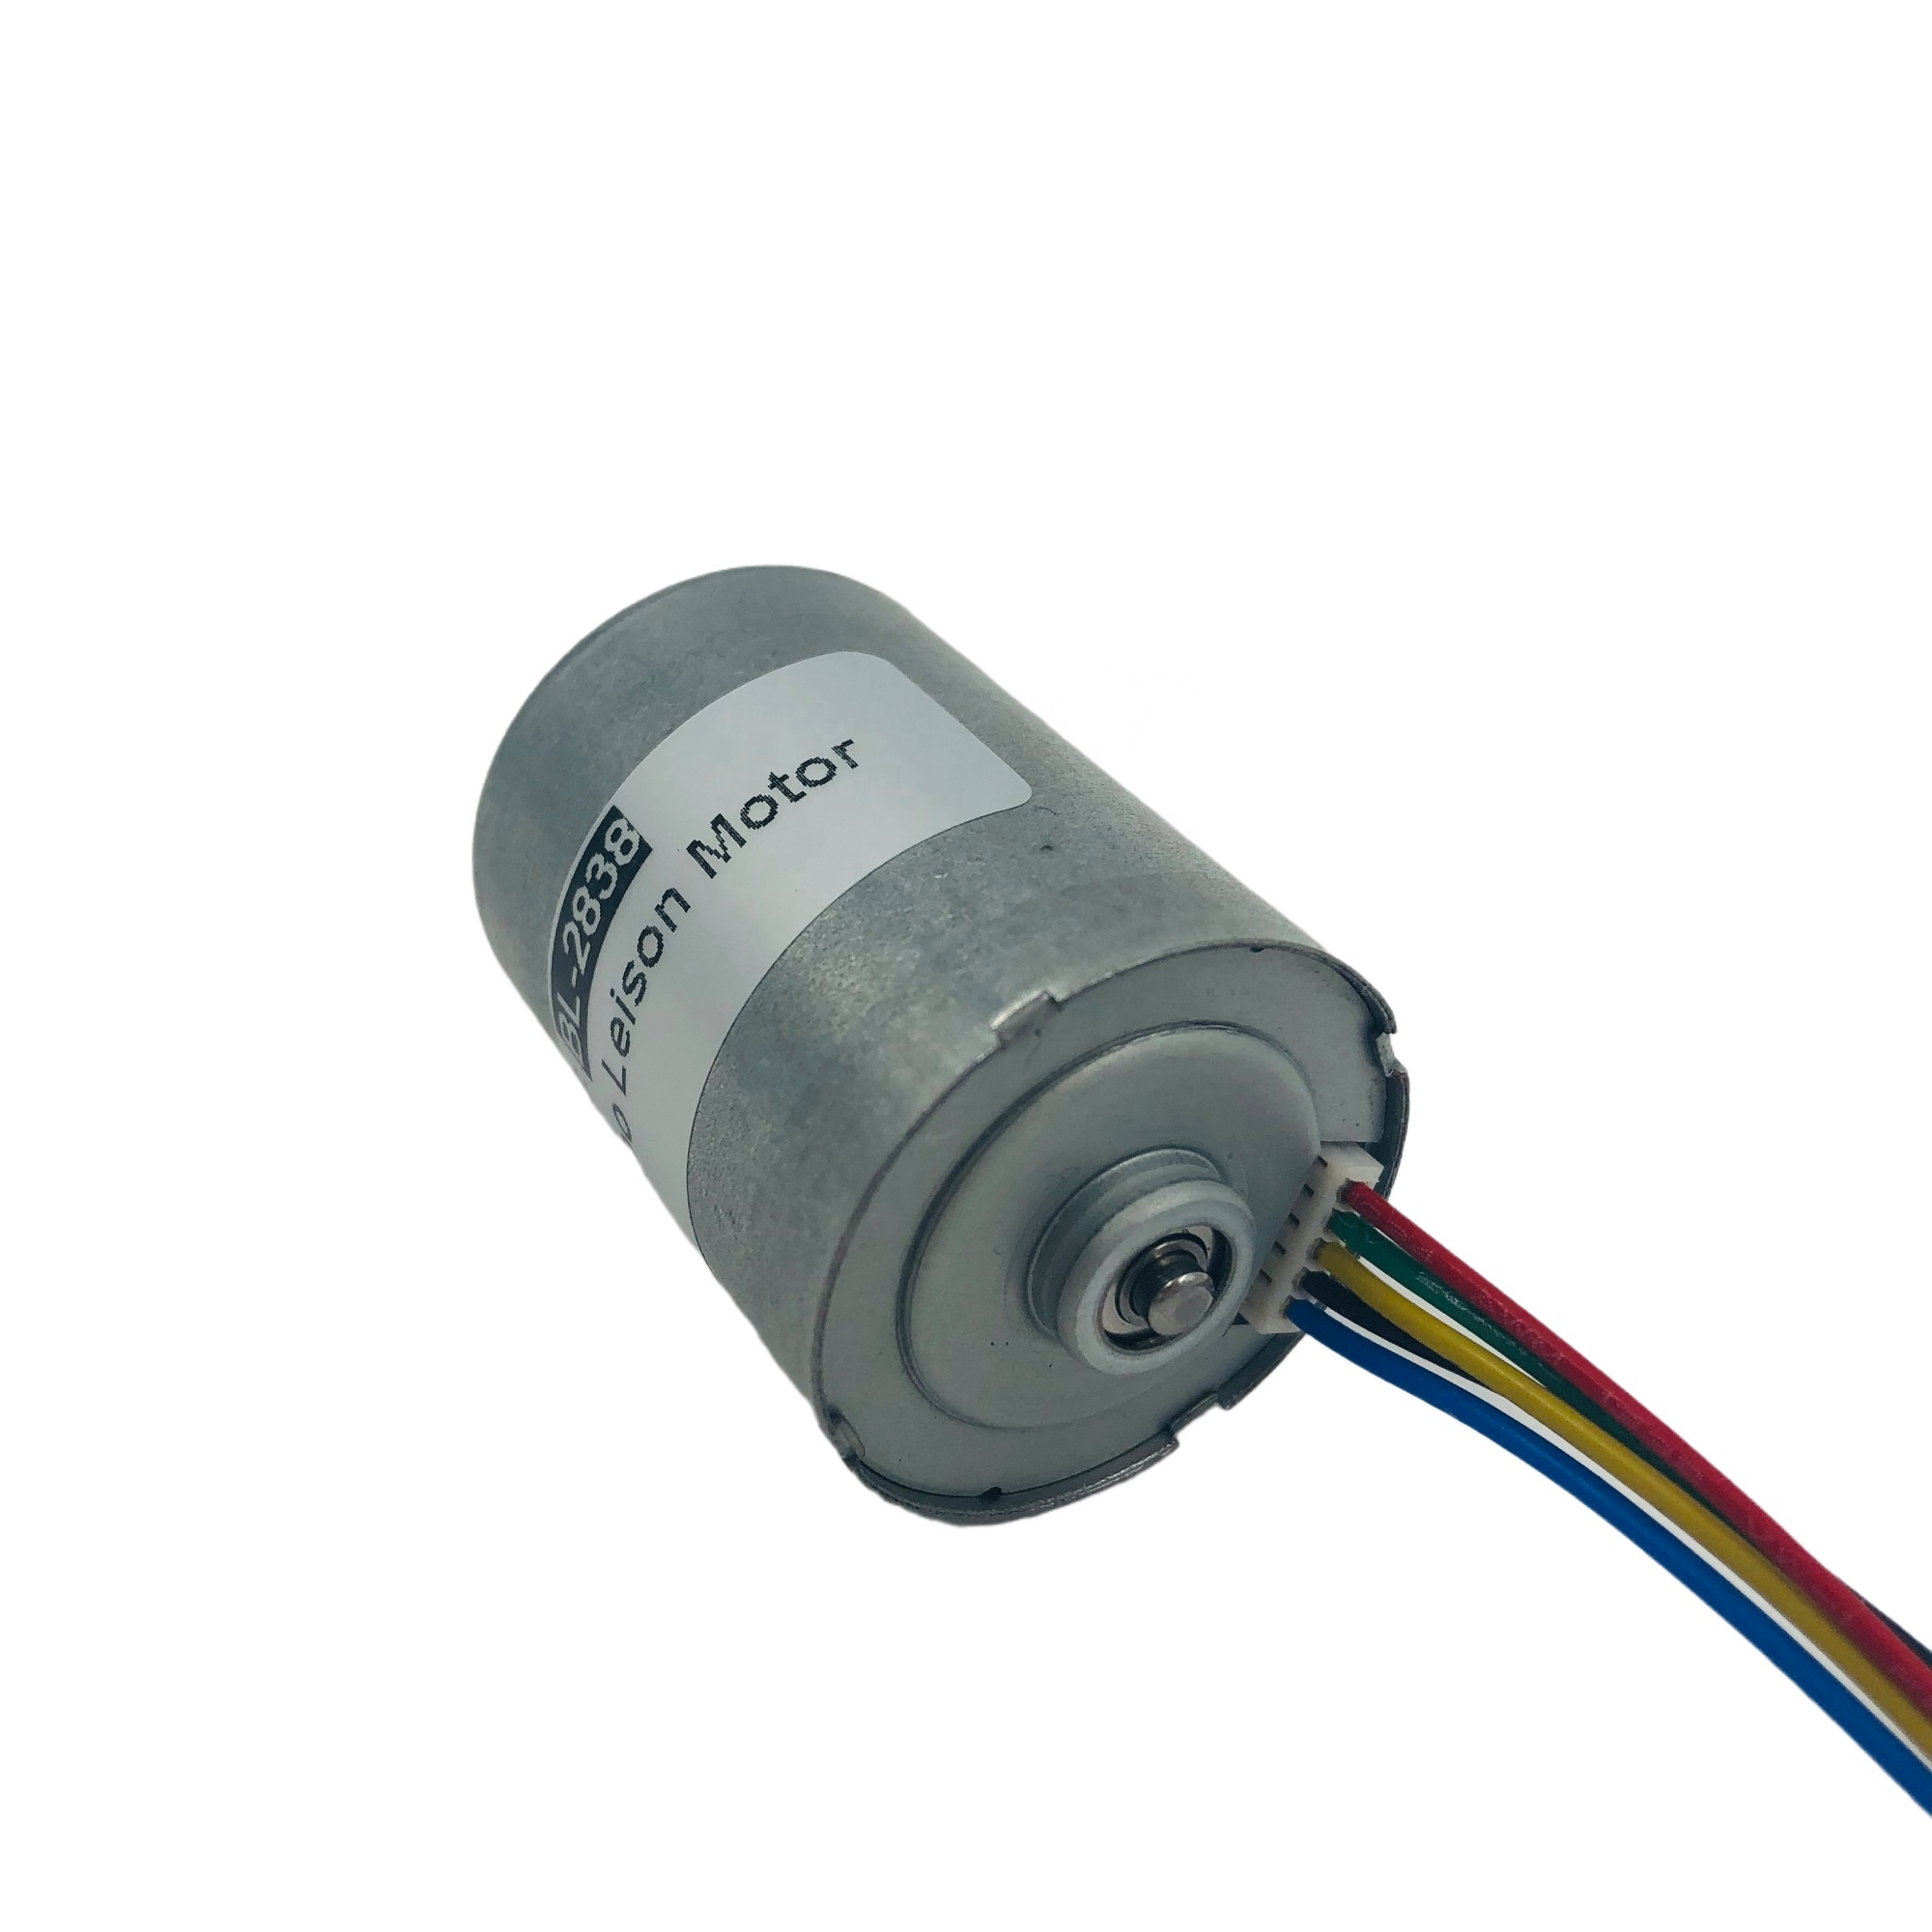 28 mm Brushless Micro Gearless DC Motor for Hair Dryer